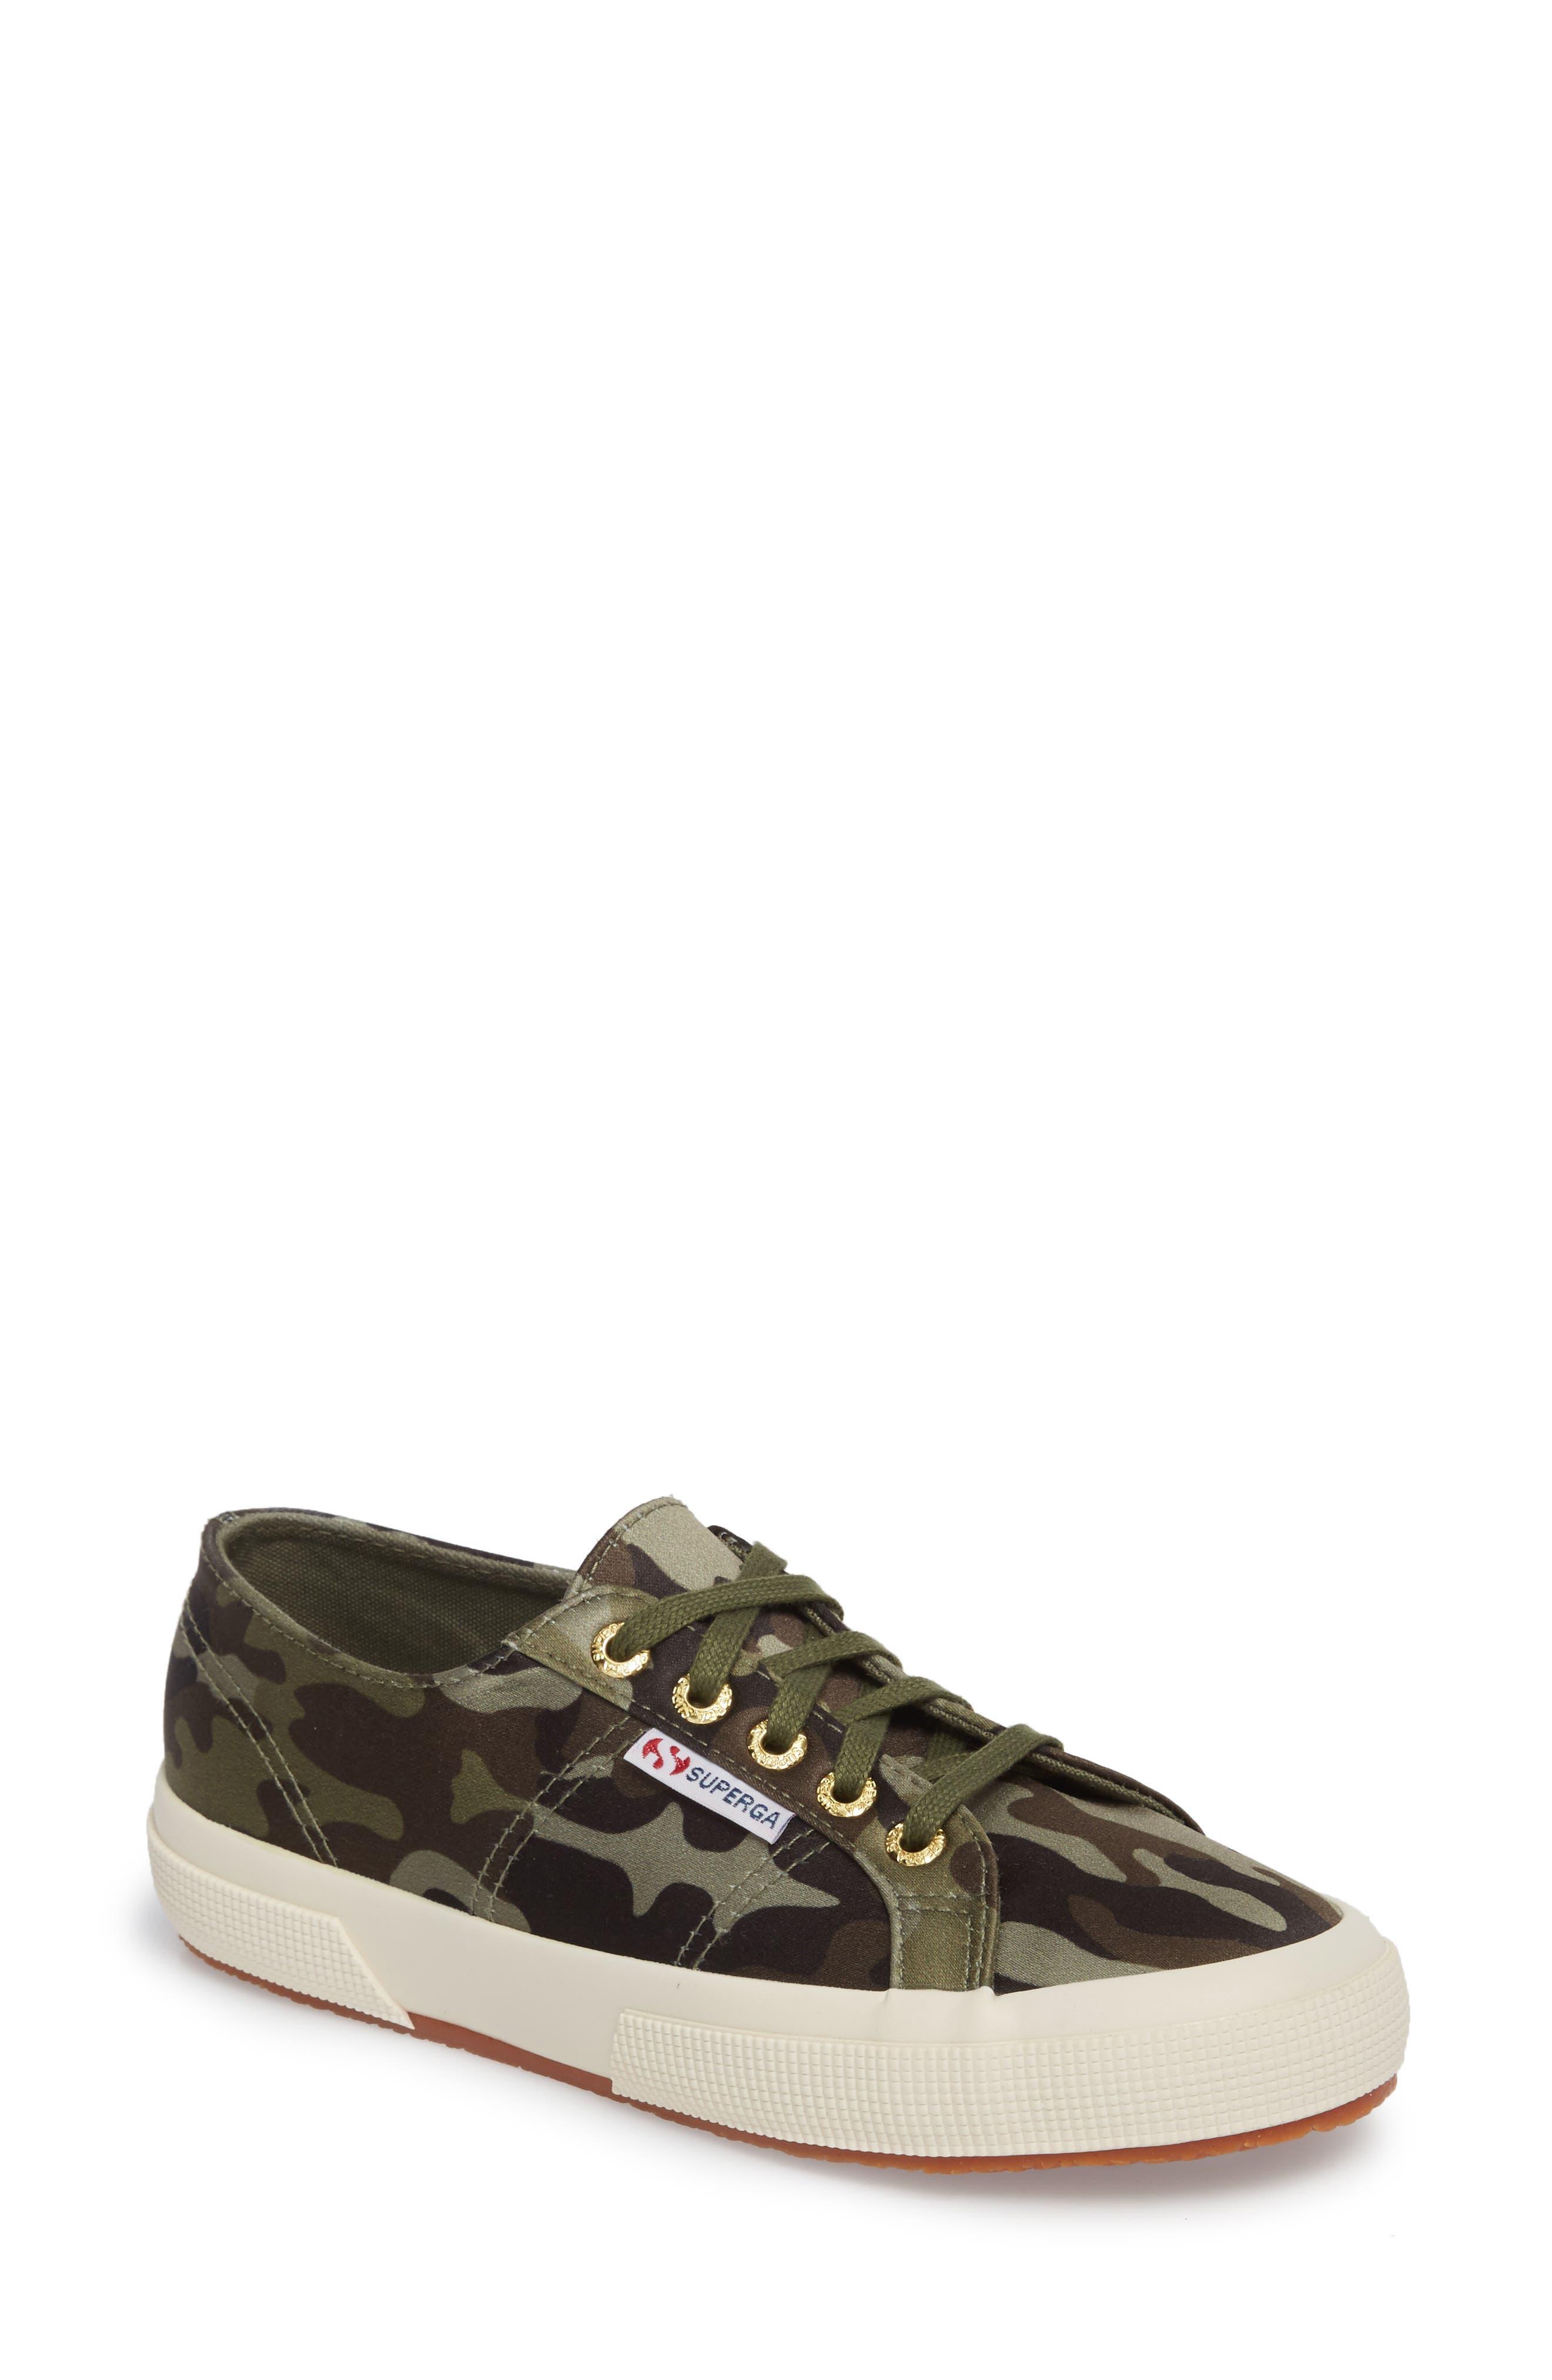 Main Image - Superga 2750 Sneaker (Women)